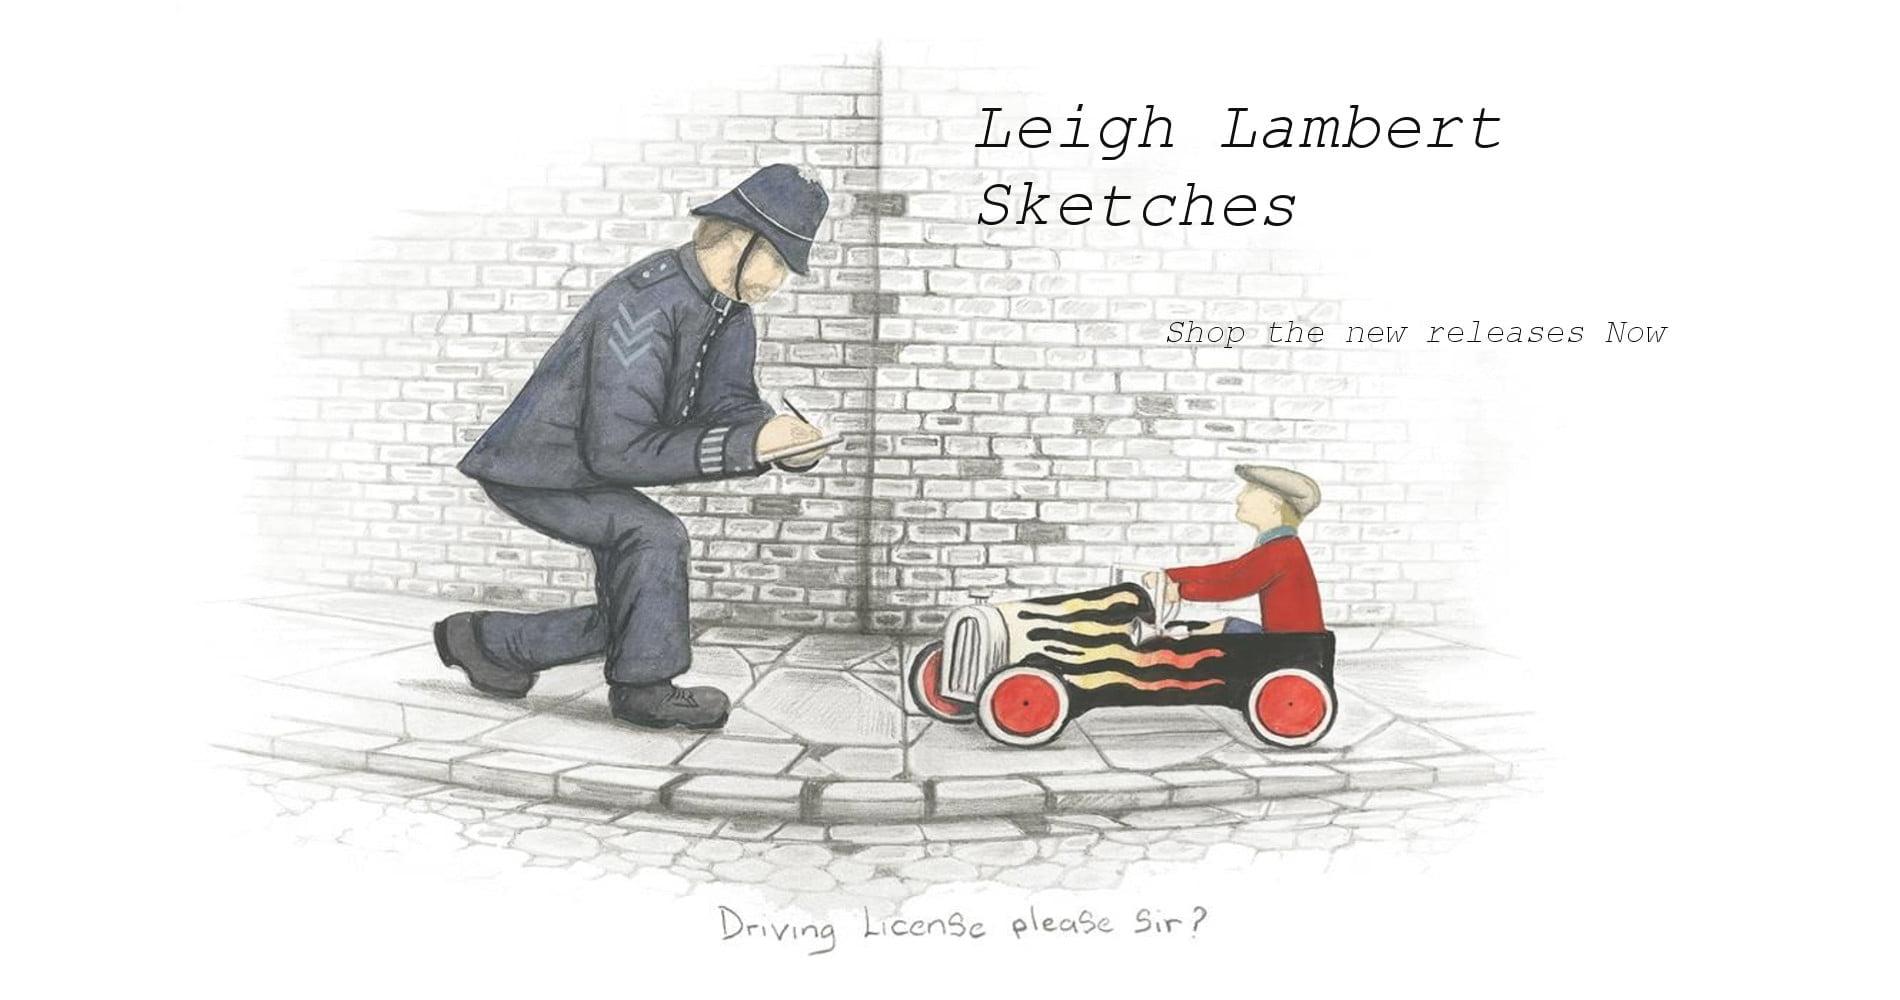 leigh lambert sketches release